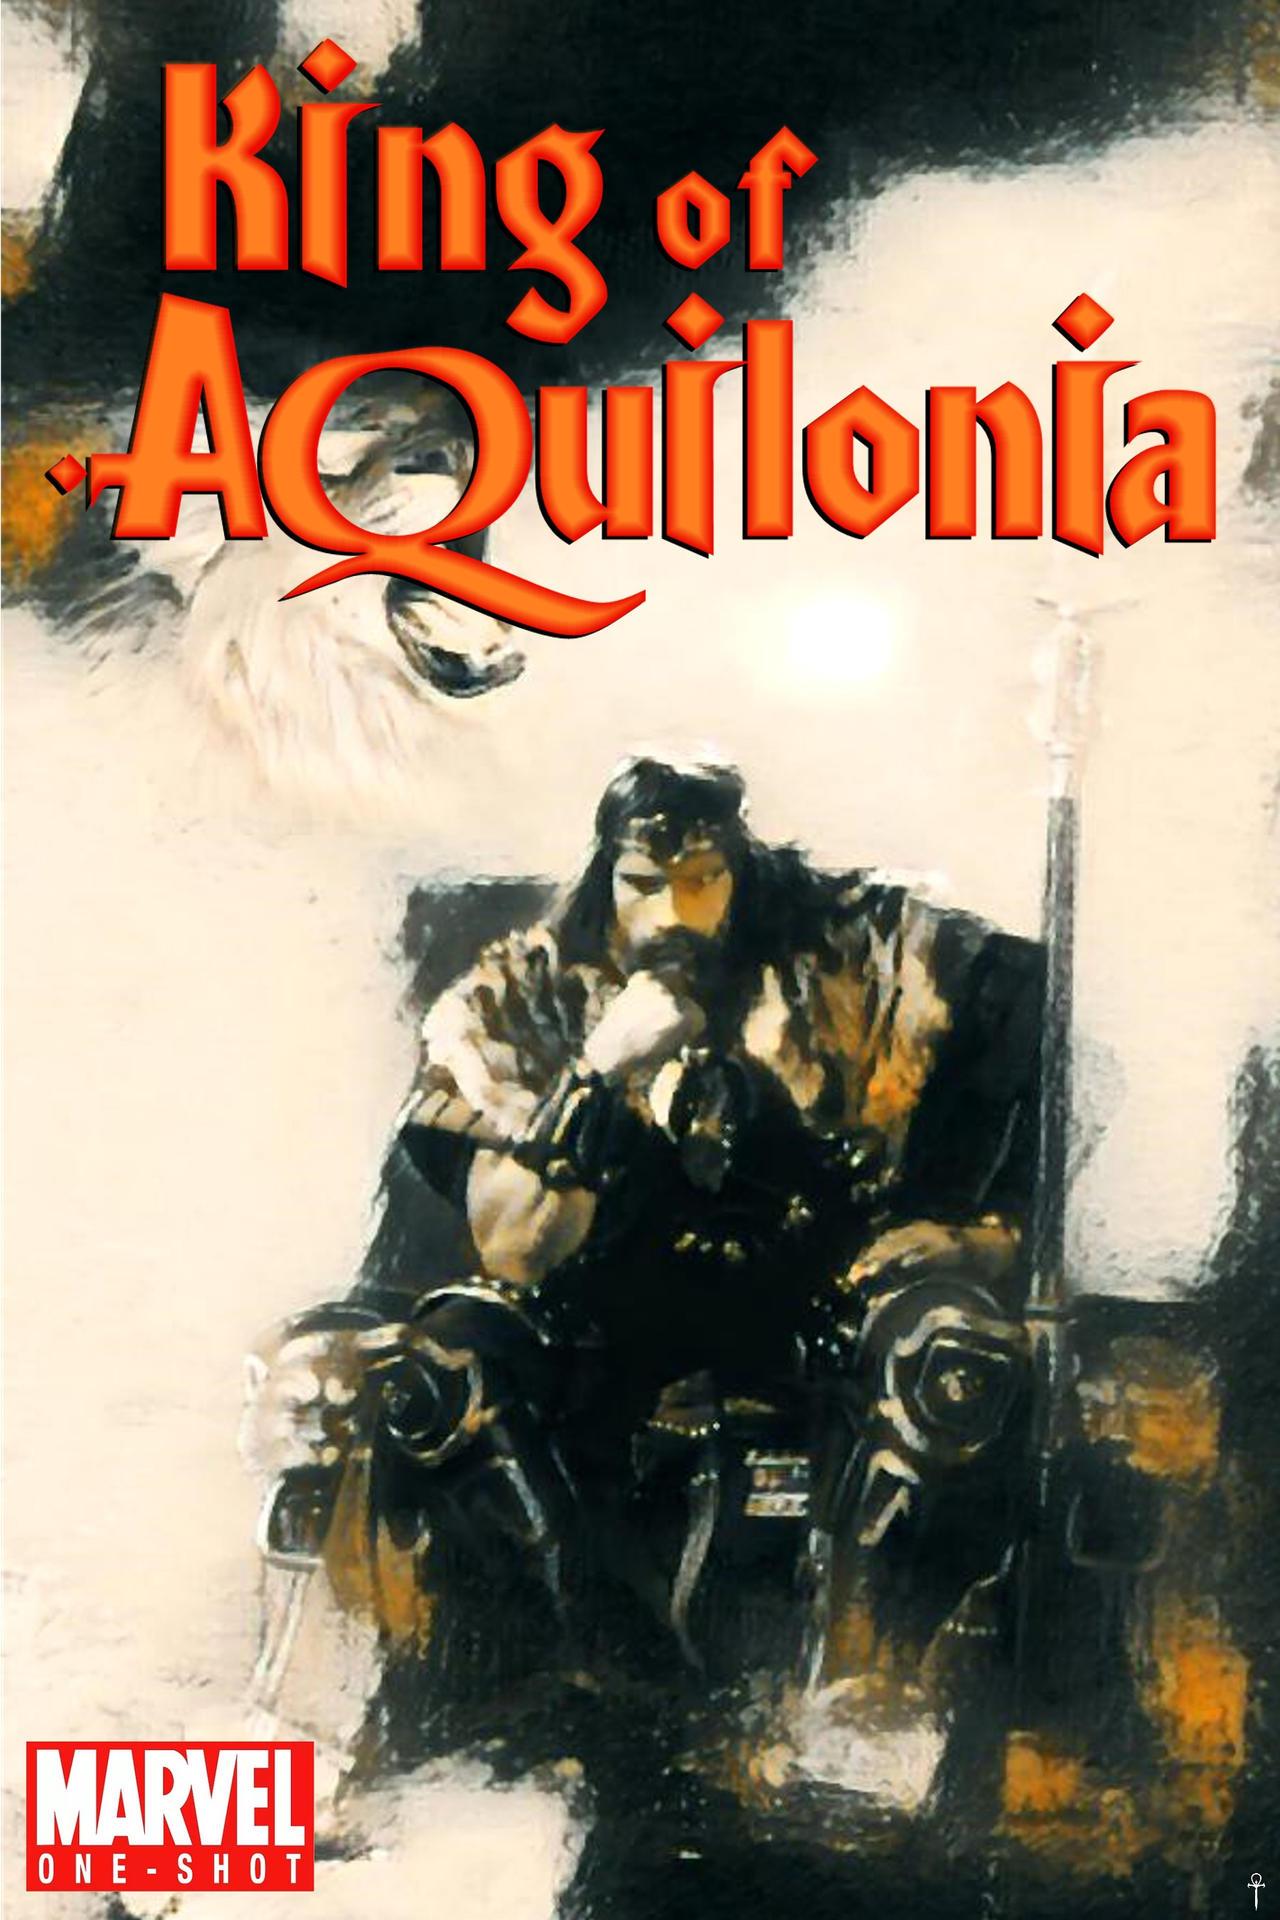 King of Aquilonia (one shot)